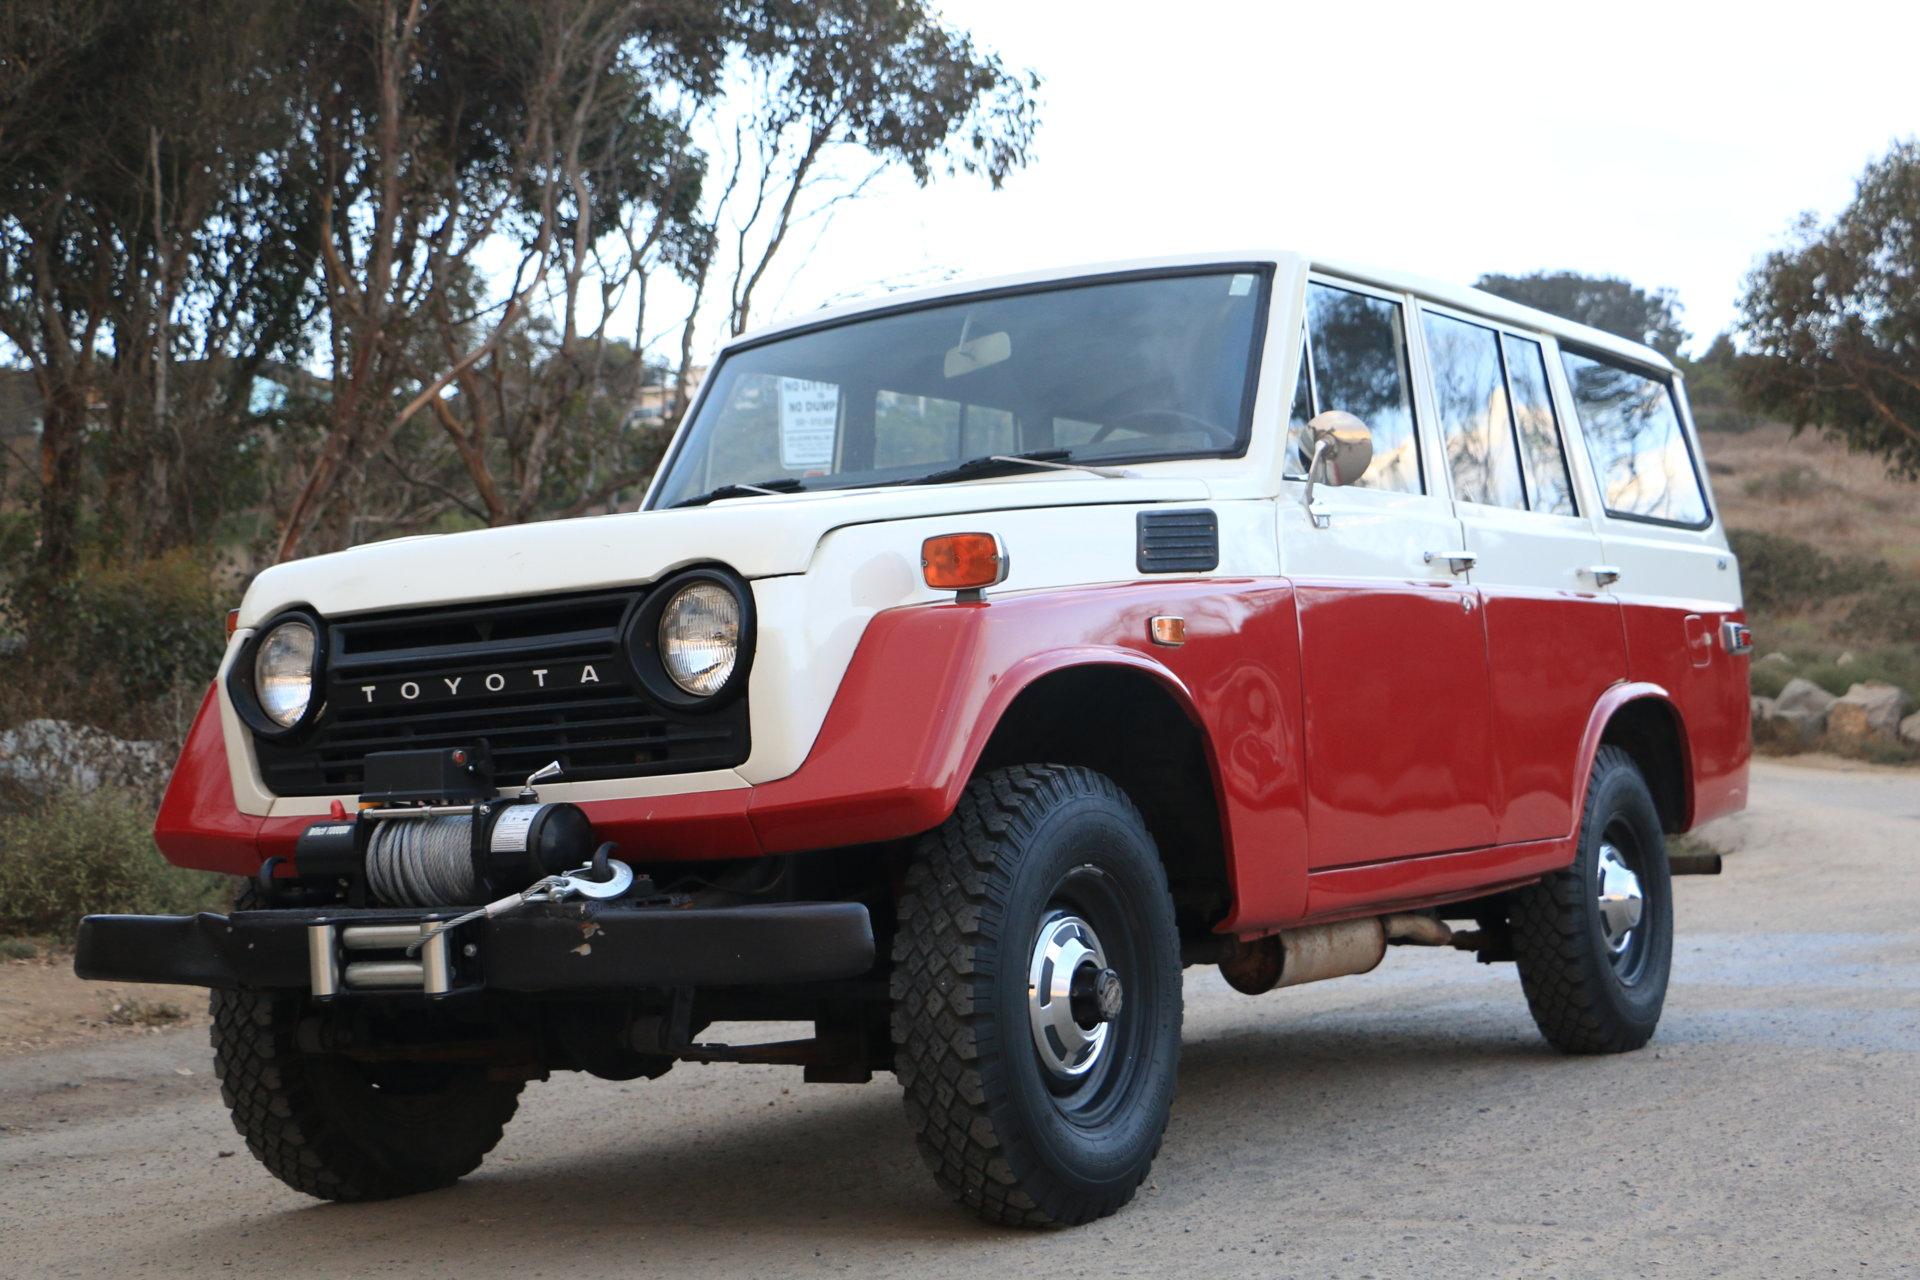 For Sale 1973 Toyota Fj55 Land Cruiser Ih8mud Forum Ebay Img 5276